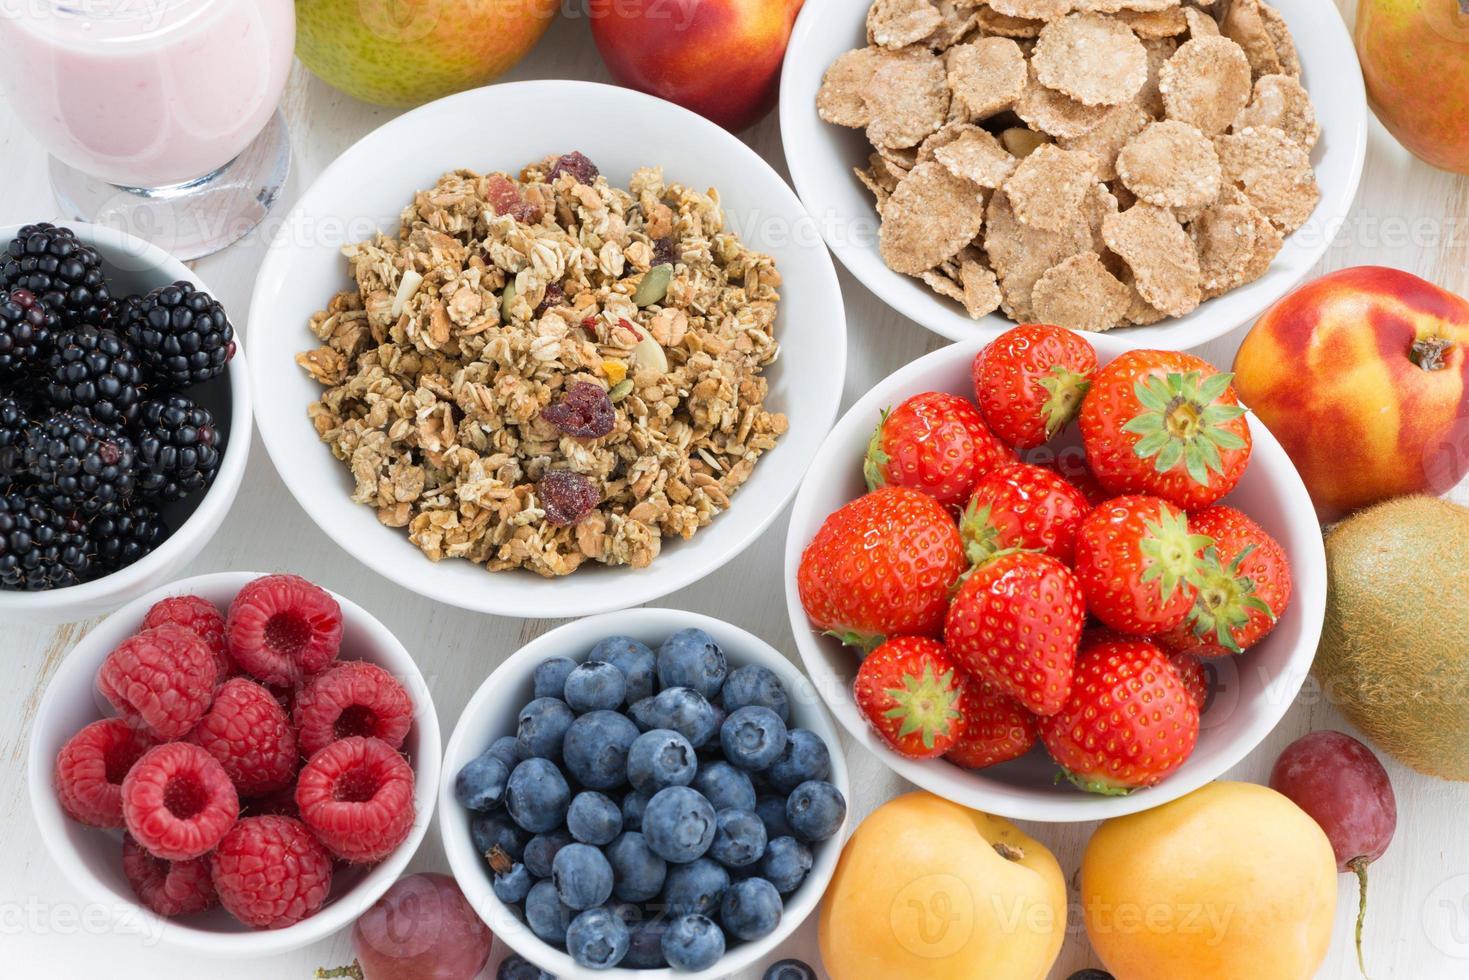 fresh berries, fruit and muesli, top view photo